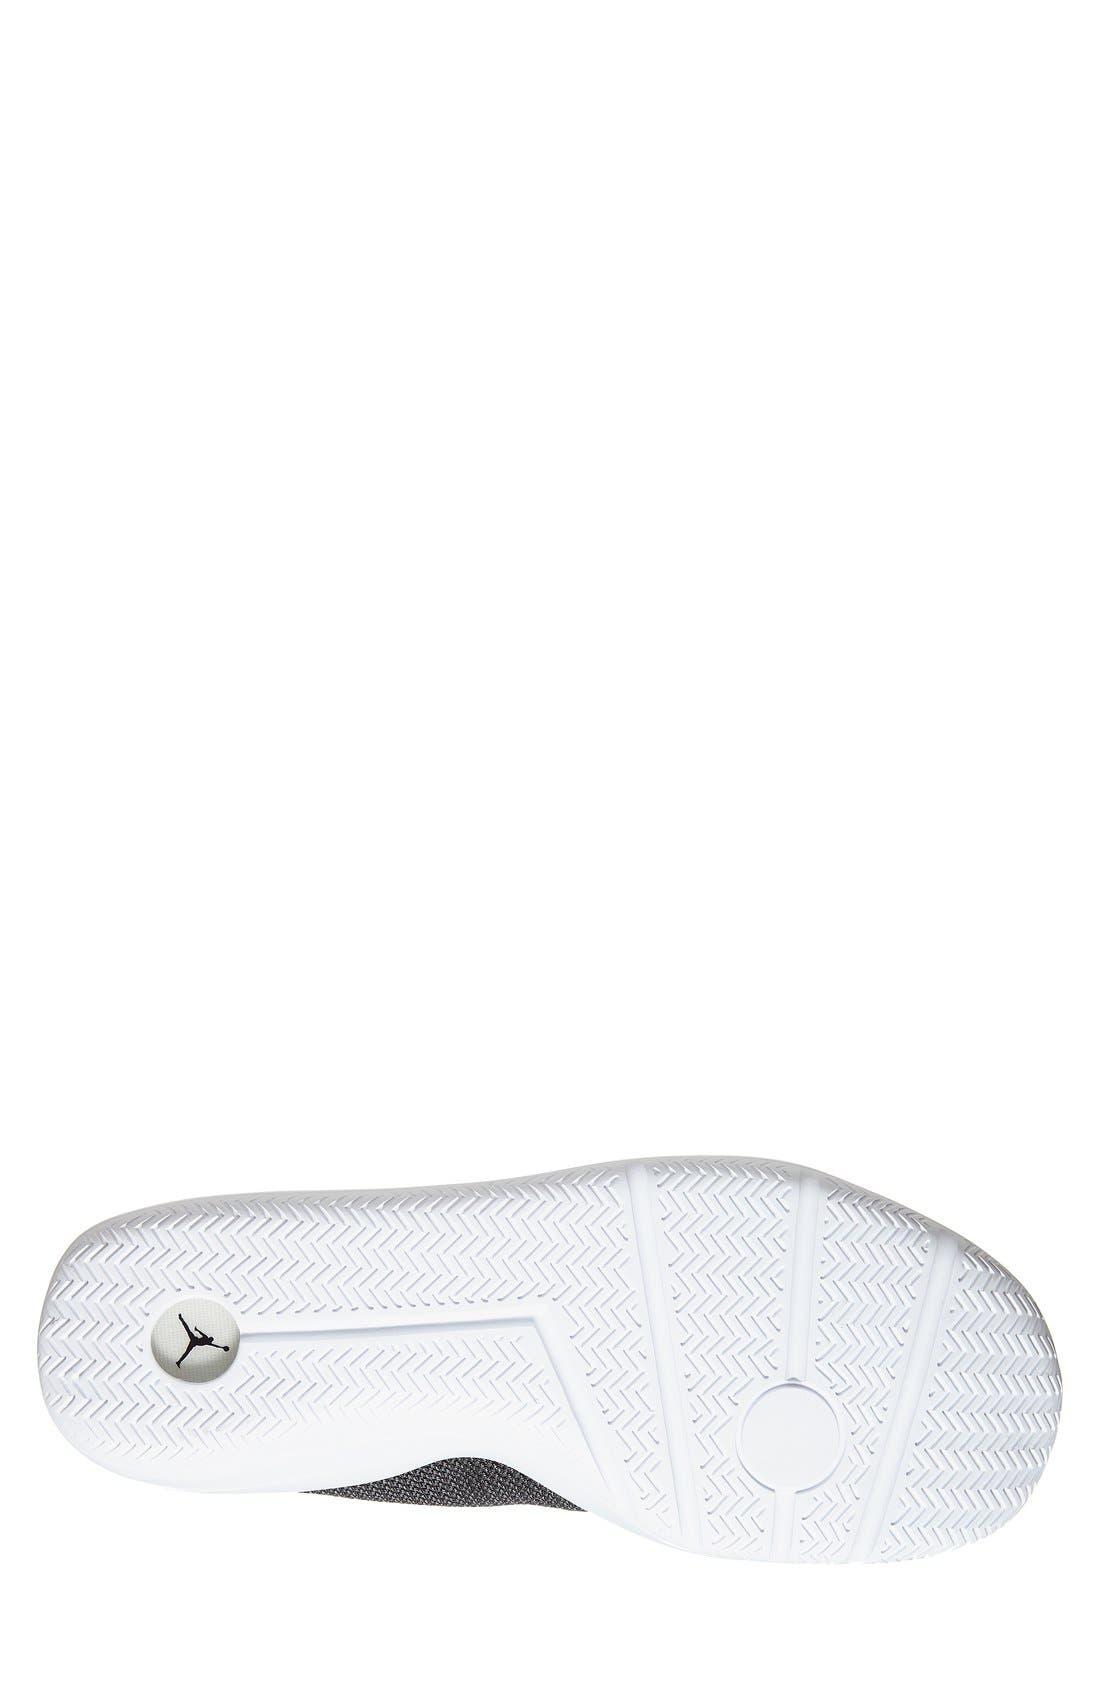 Alternate Image 4  - Nike 'Jordan Eclipse' Sneaker (Men)